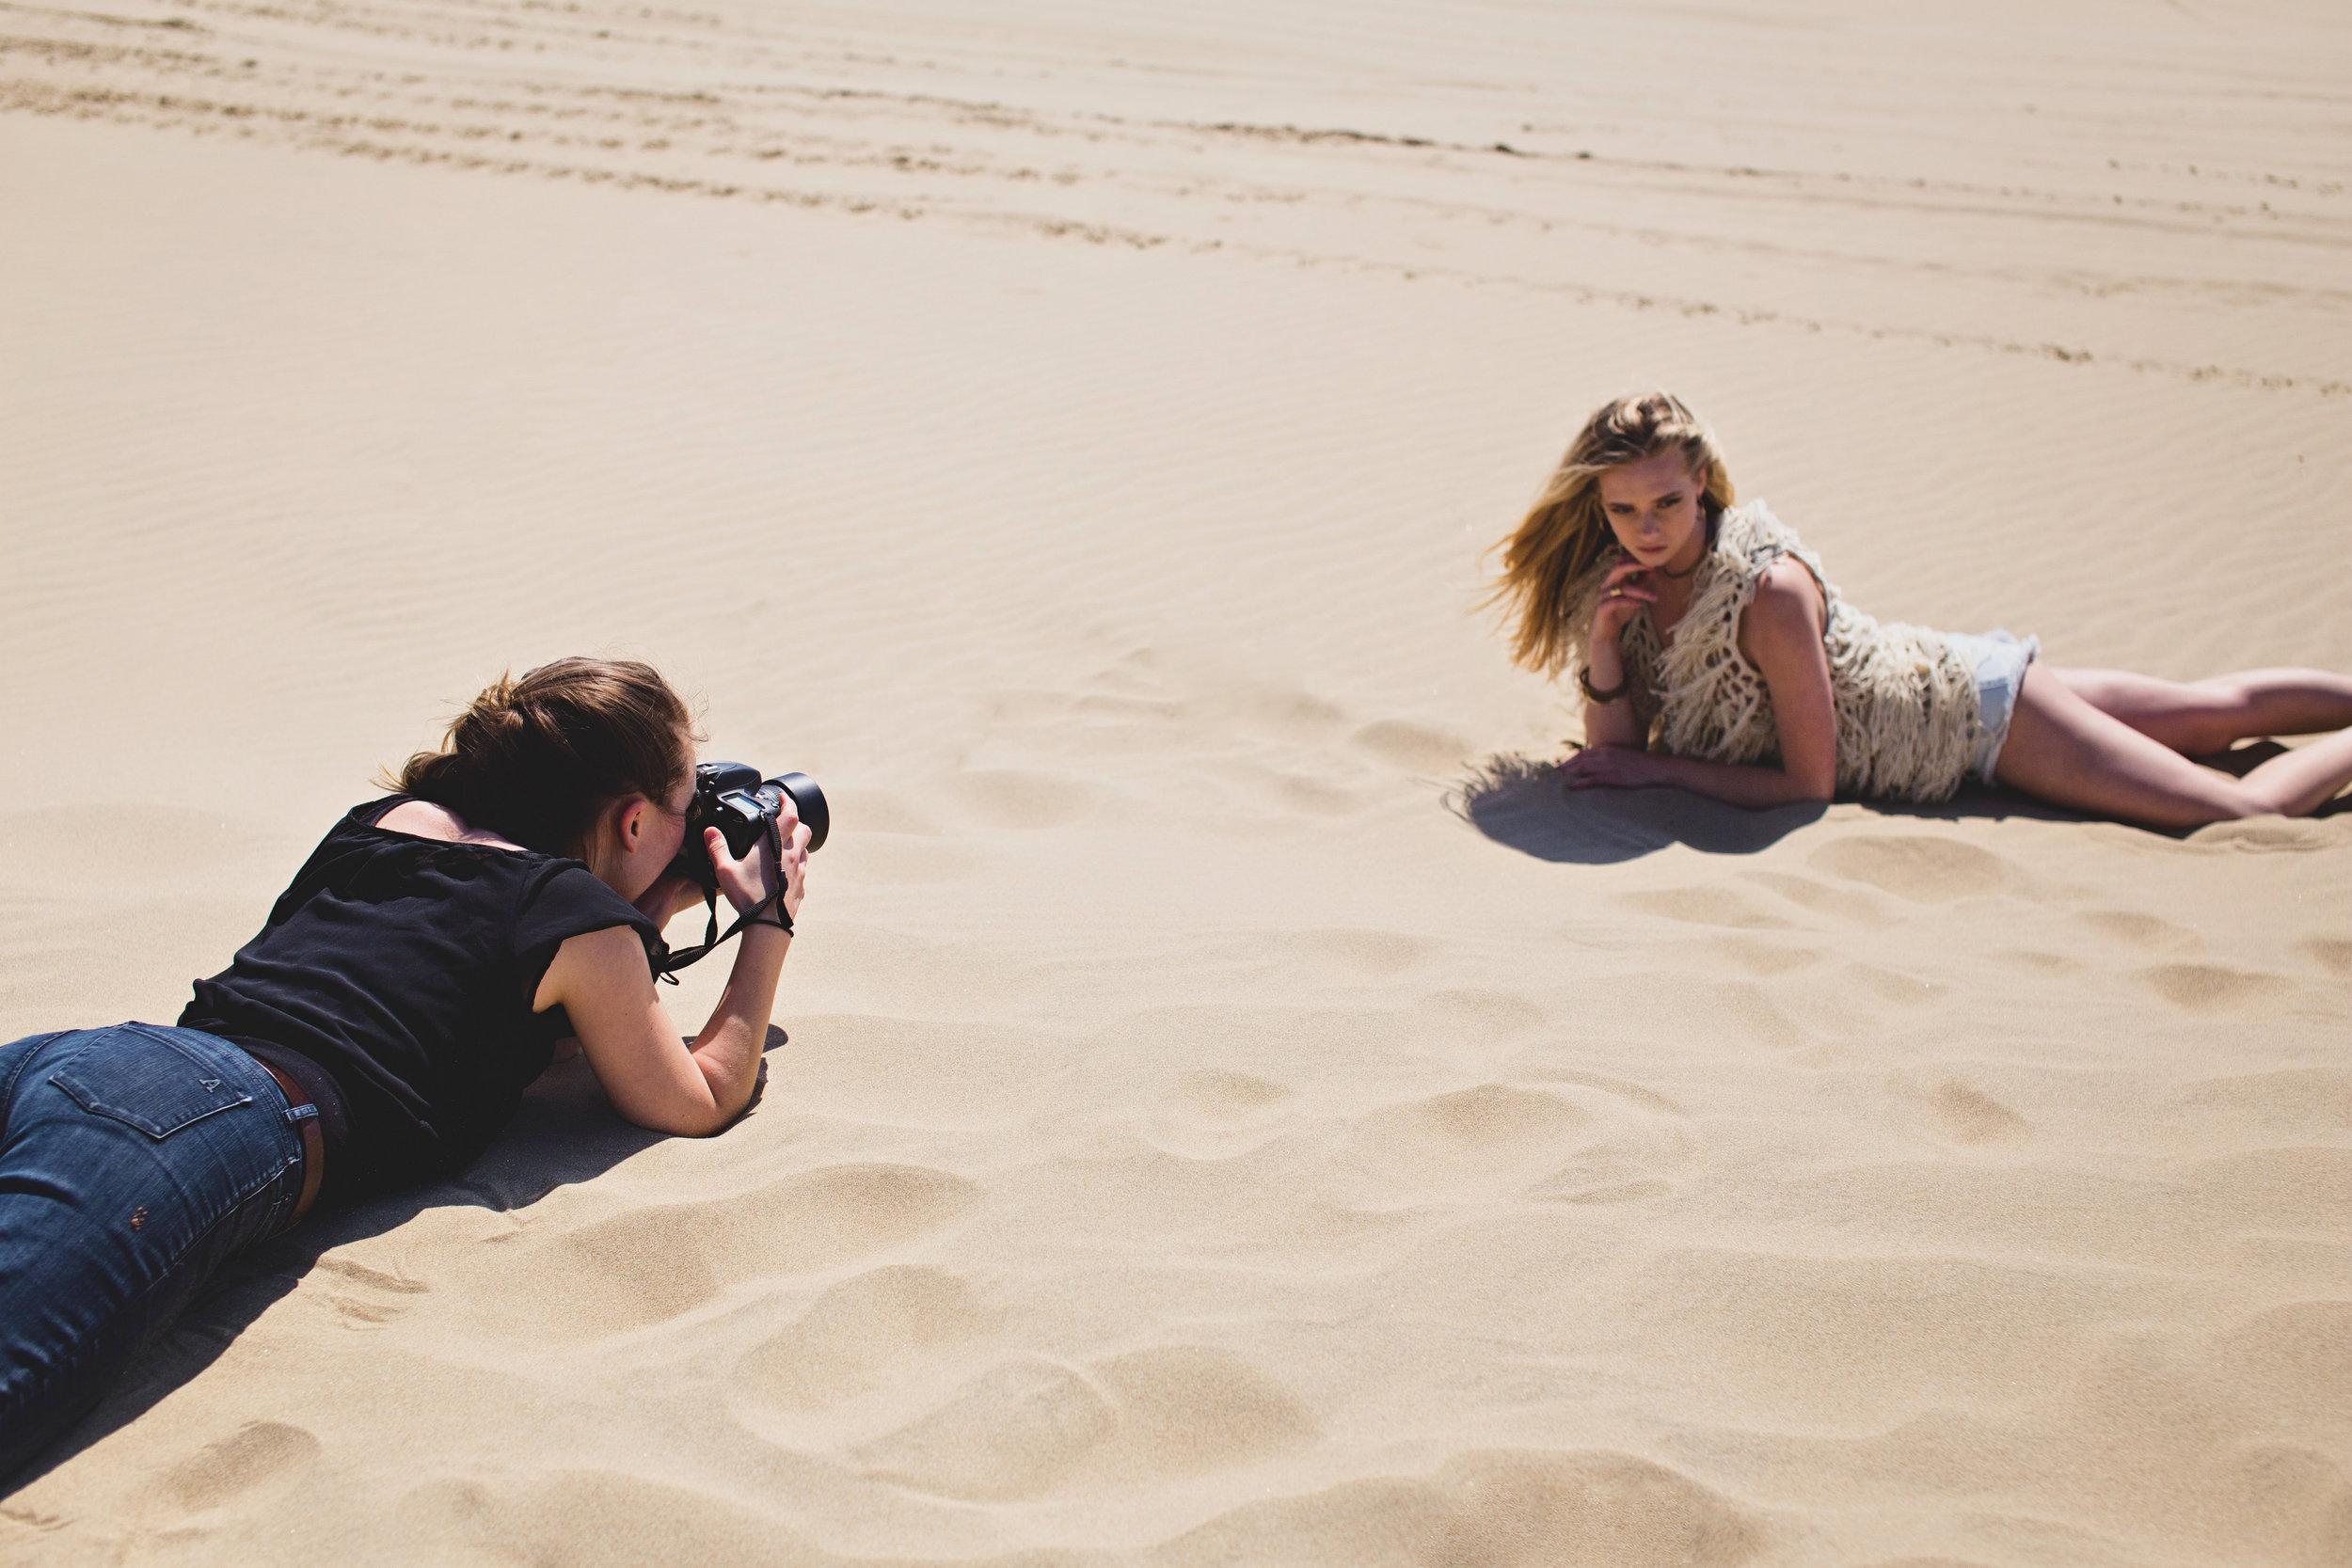 LA Fashion magazine photographer